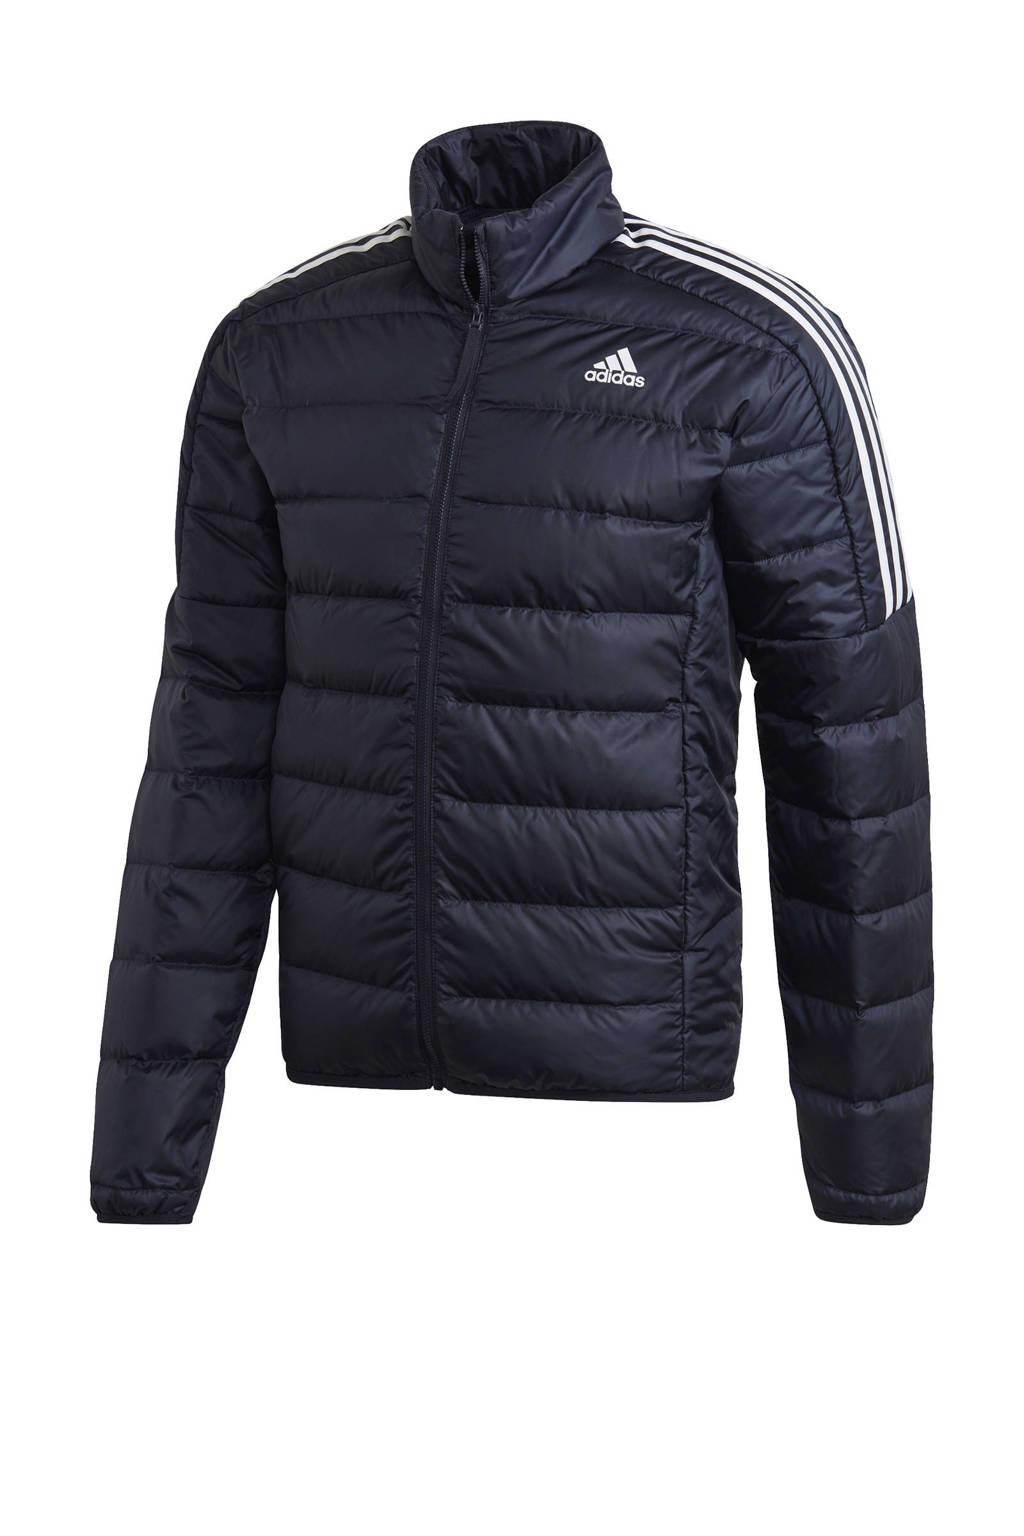 adidas Performance gewatteerde jas donkerblauw, Donkerblauw